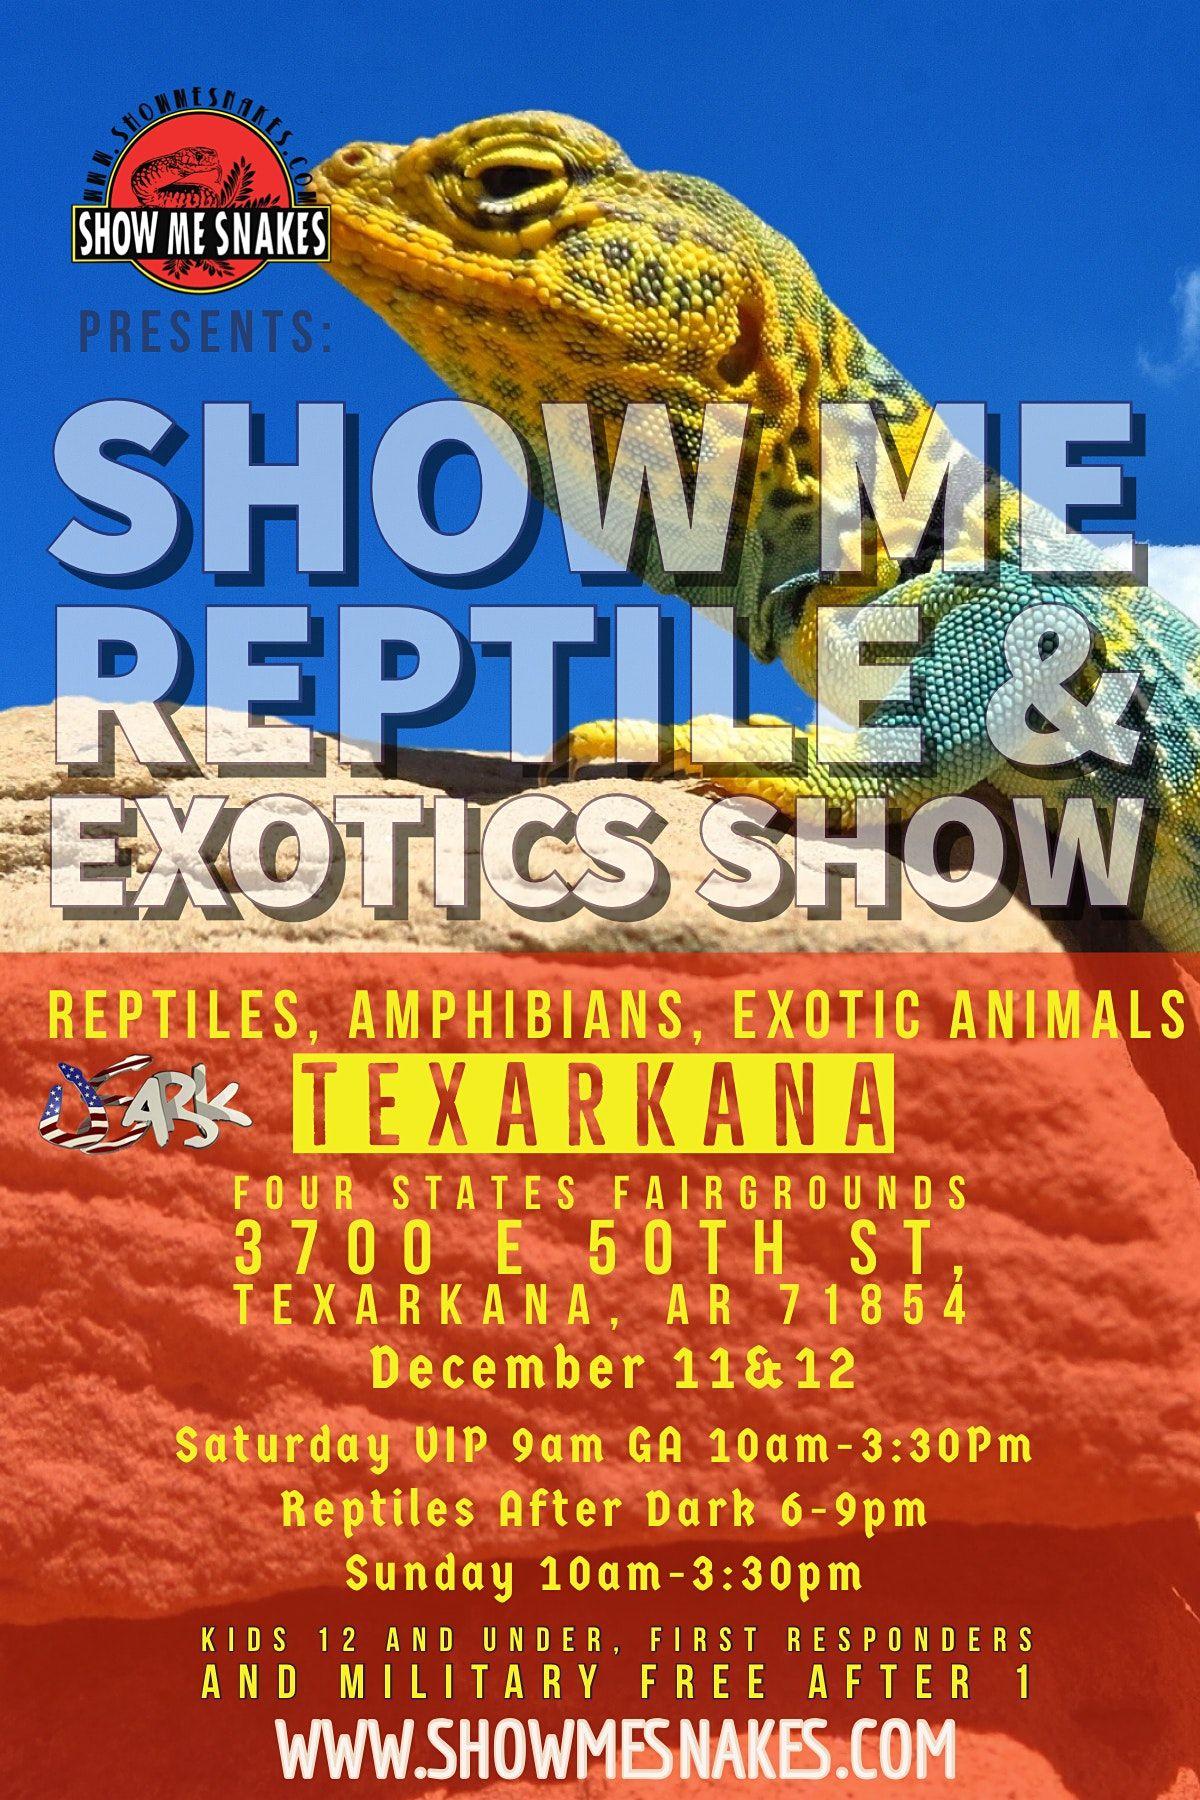 Show Me Reptile & Exotics Show (Texarkana, AR)